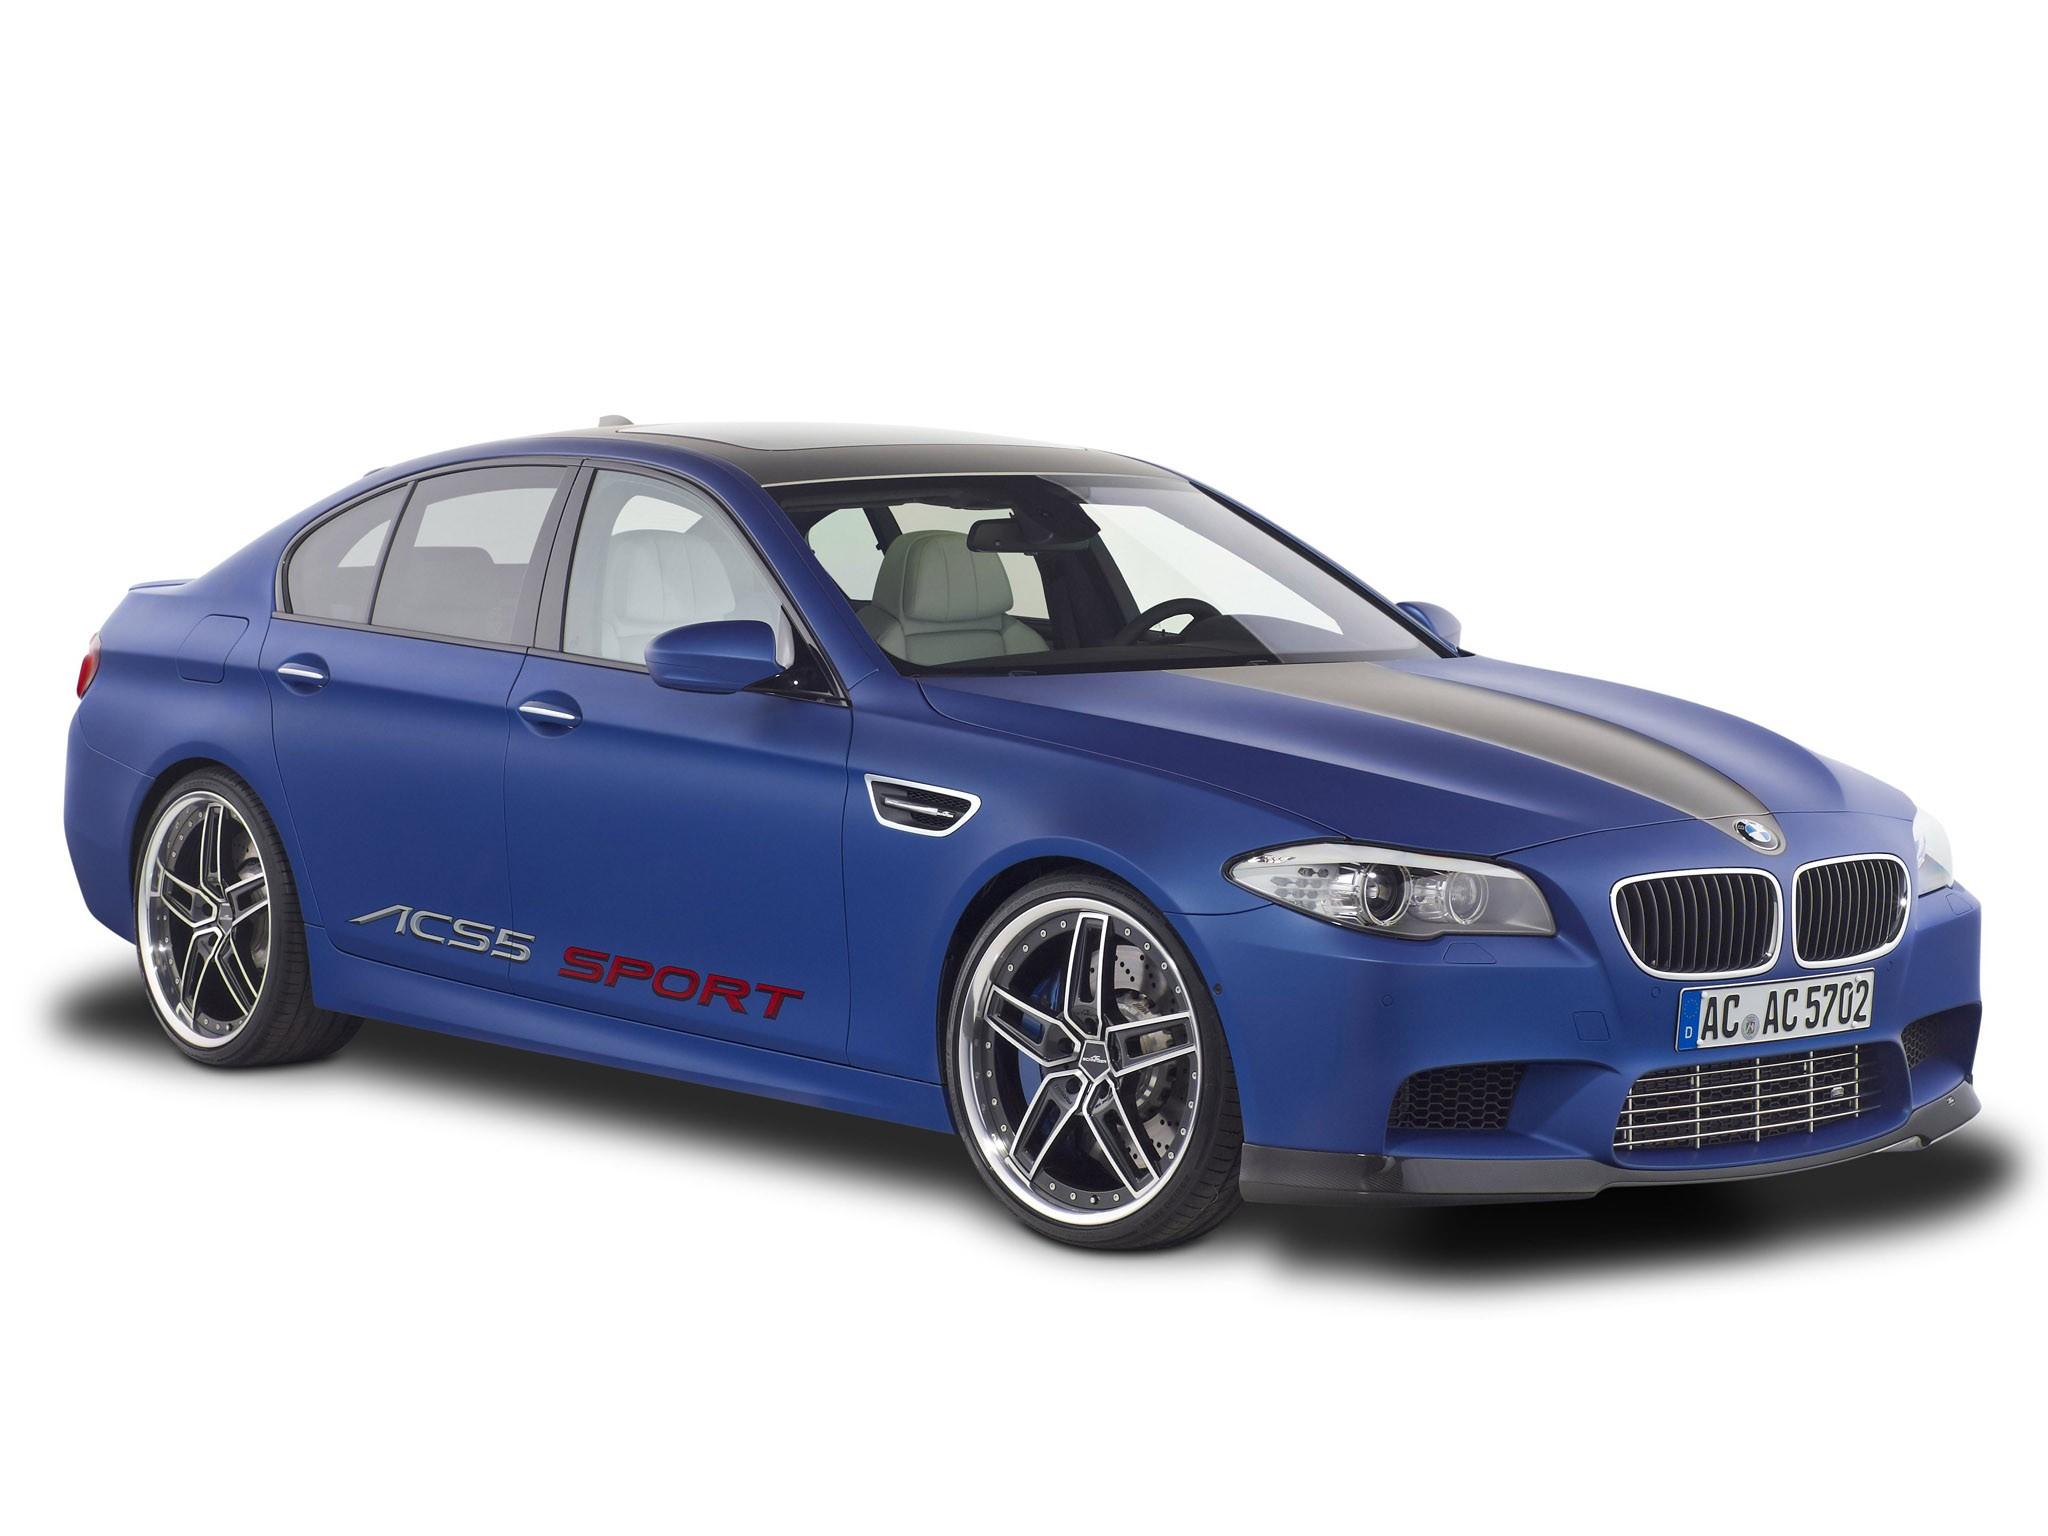 2012 AC Schnitzer - Bmw 5 Series acs5 Sport F10